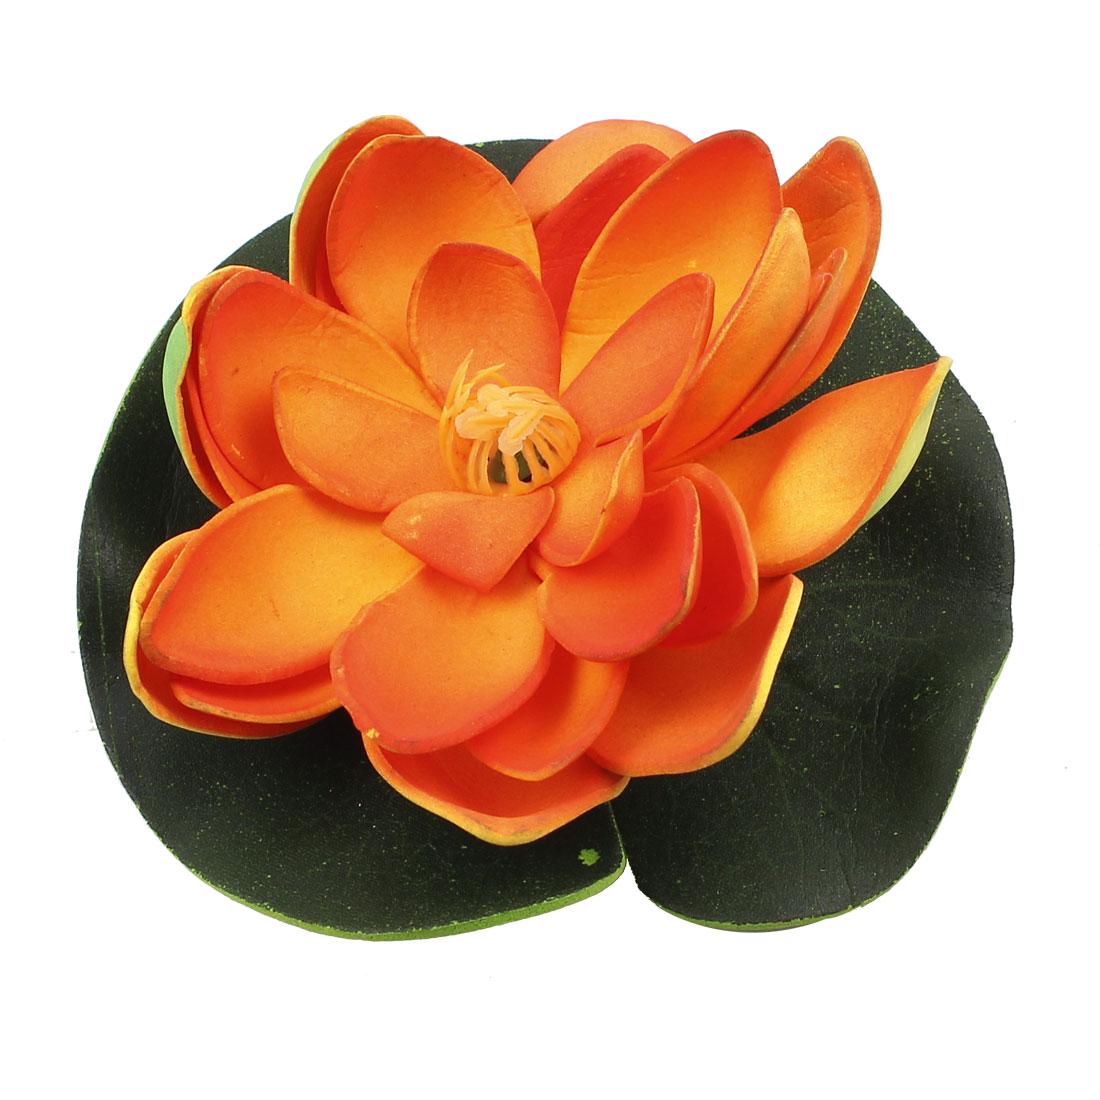 Foam Artificial Plants Lotus Shaped Aquarium Fish Tank Decoration Orange Green